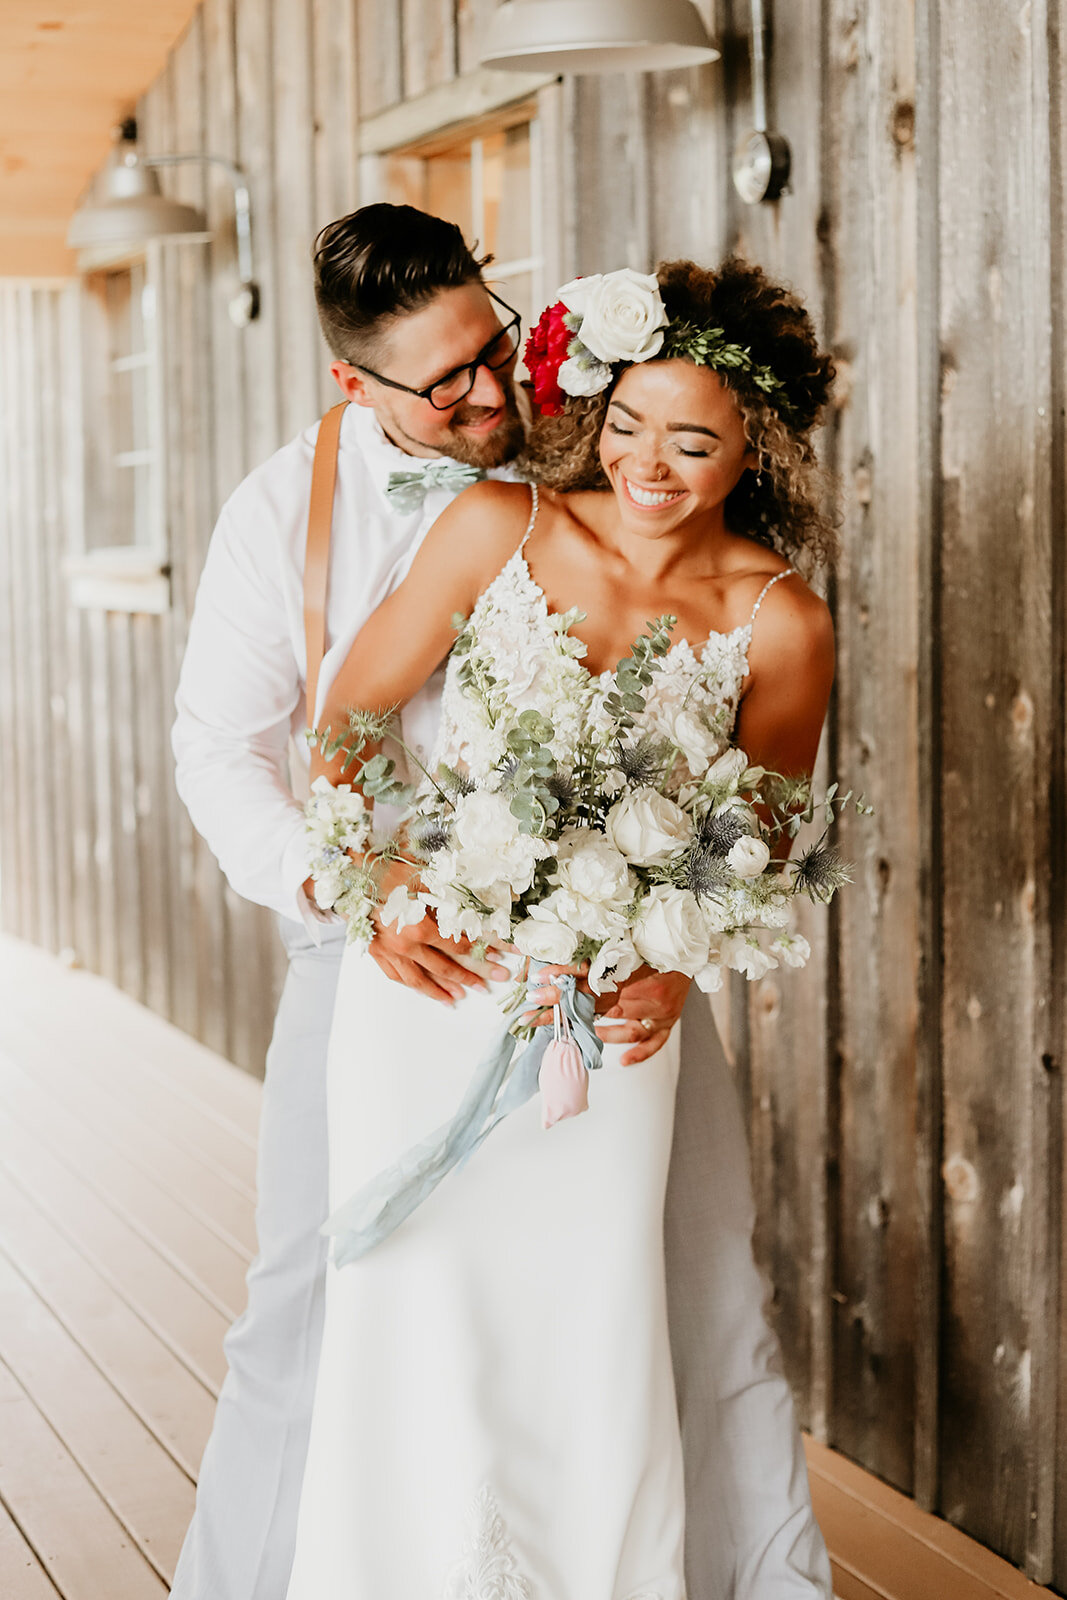 august-wolf-floral-design-des-moines-iowa-ames-wedding-florist-flowers-boho-bride-groom-lace-eucalyptus-crown.jpg